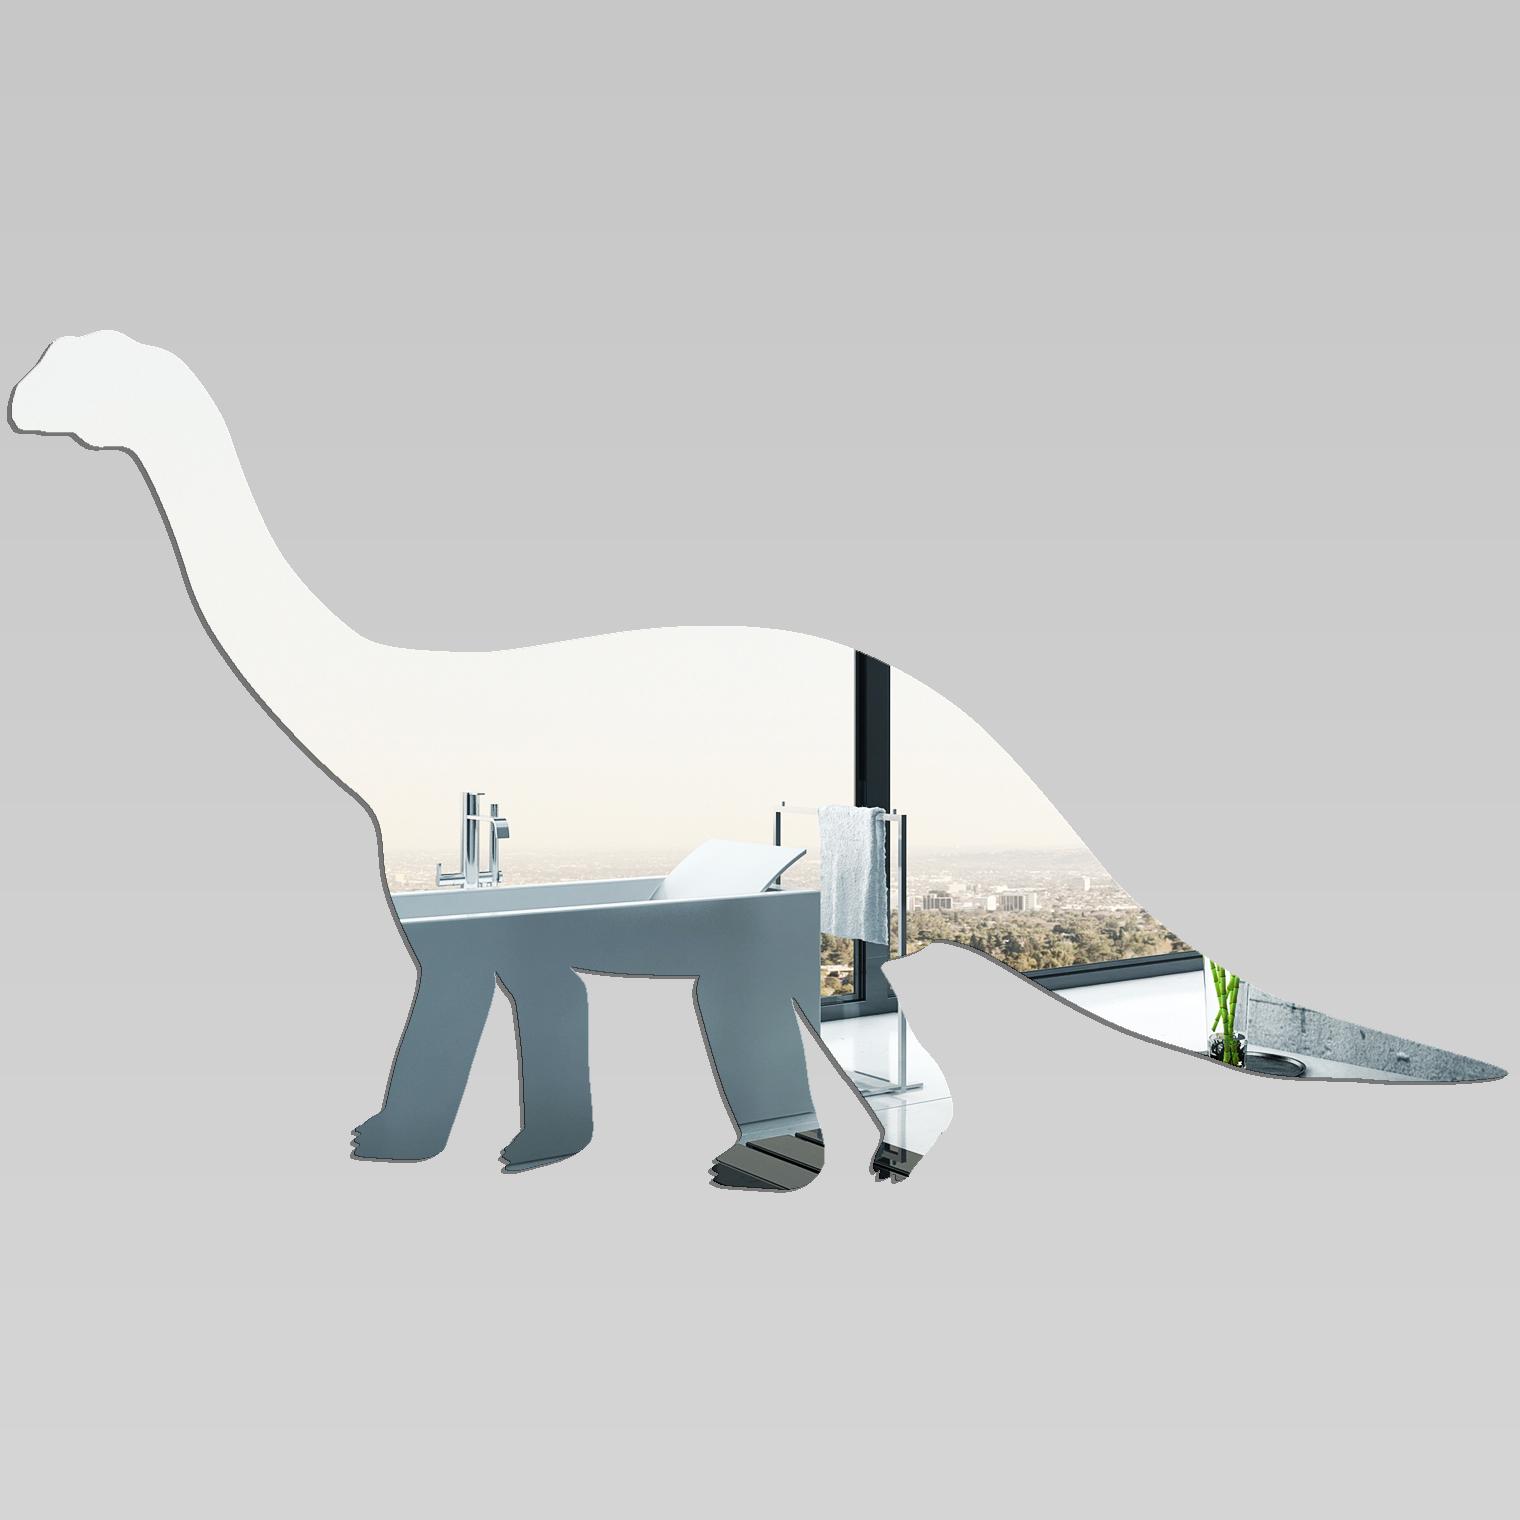 Miroir plexiglass acrylique dinosaure pas cher for Miroir acrylique